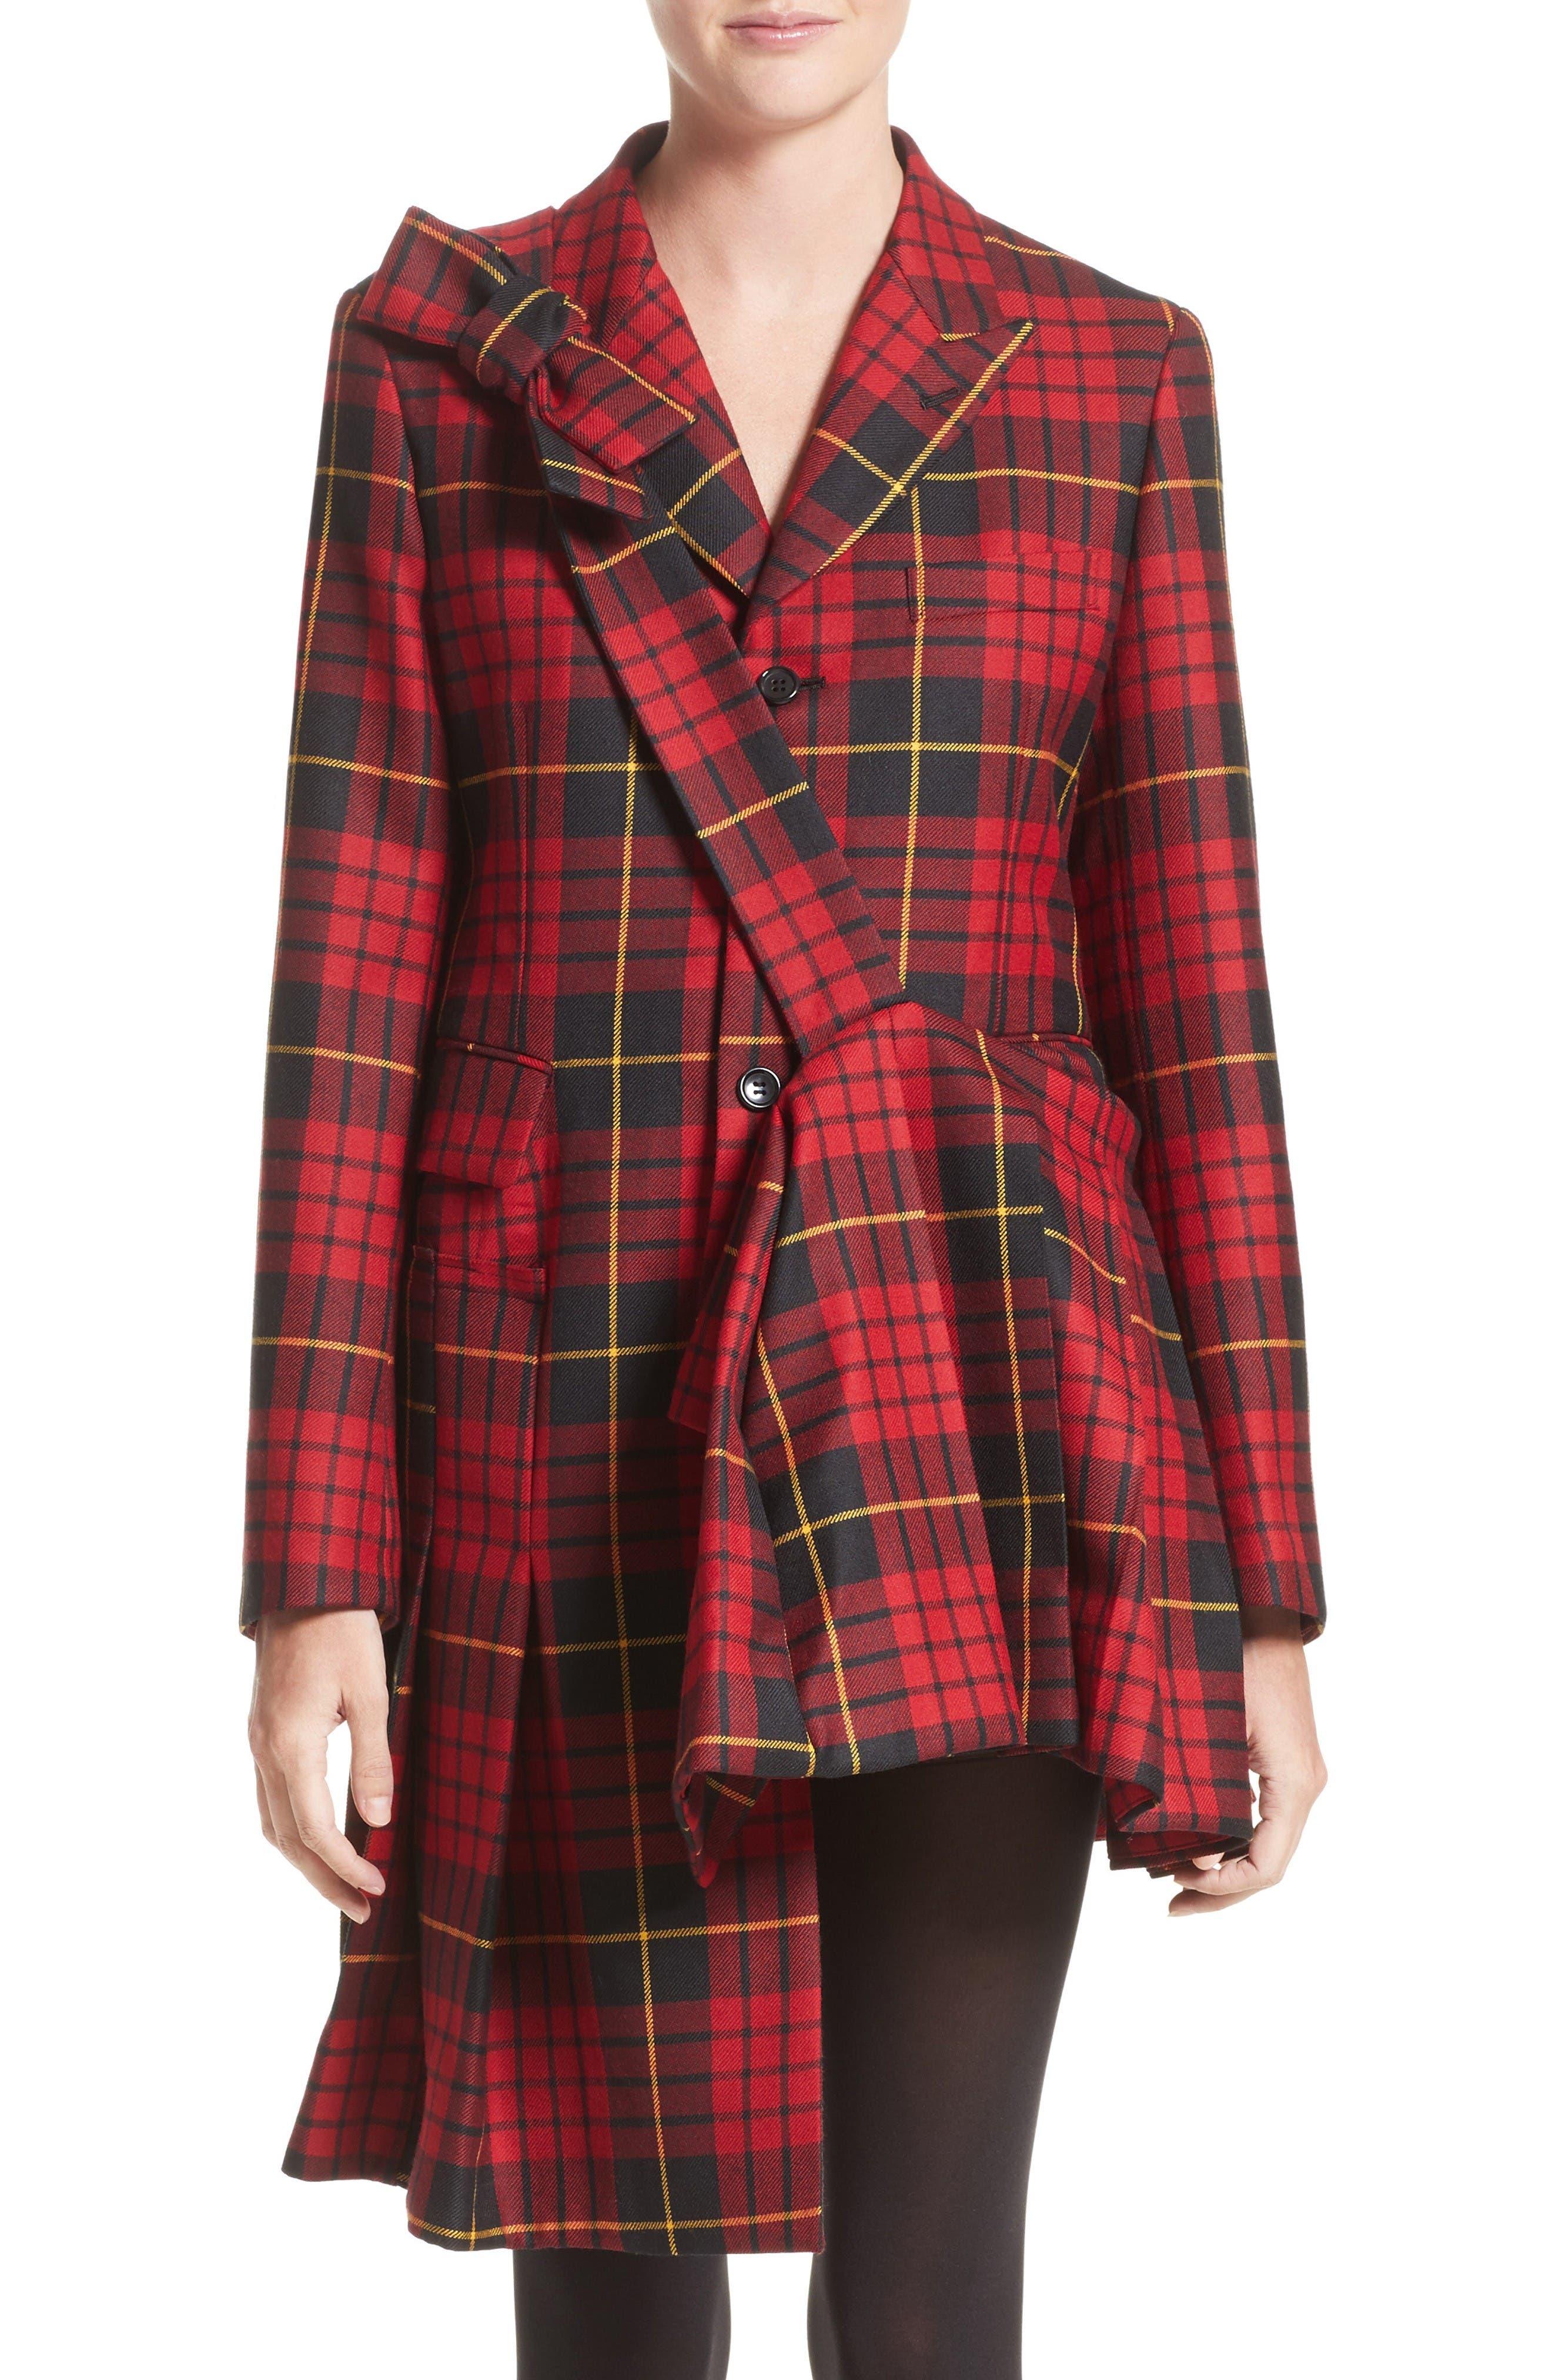 Alternate Image 1 Selected - Comme des Garçons Tartan Plaid Wool Jacket